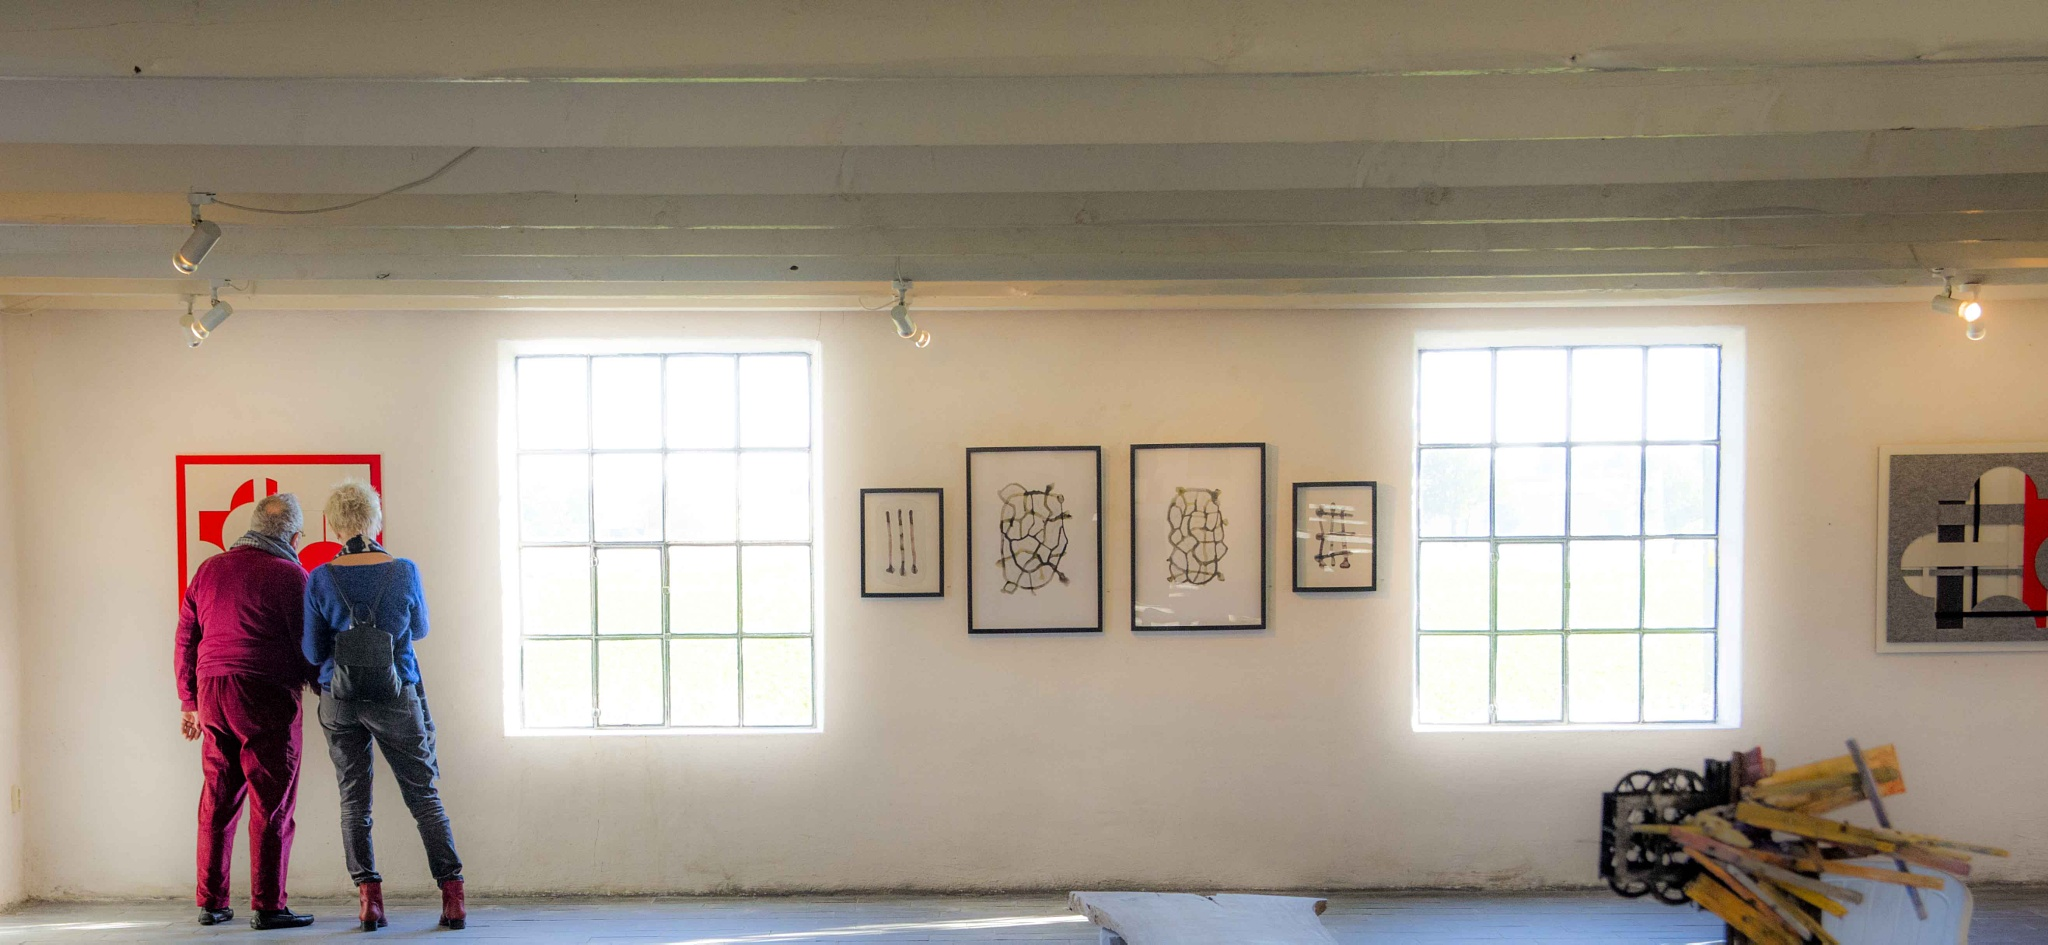 The Gallery by staffan.hakansson.9